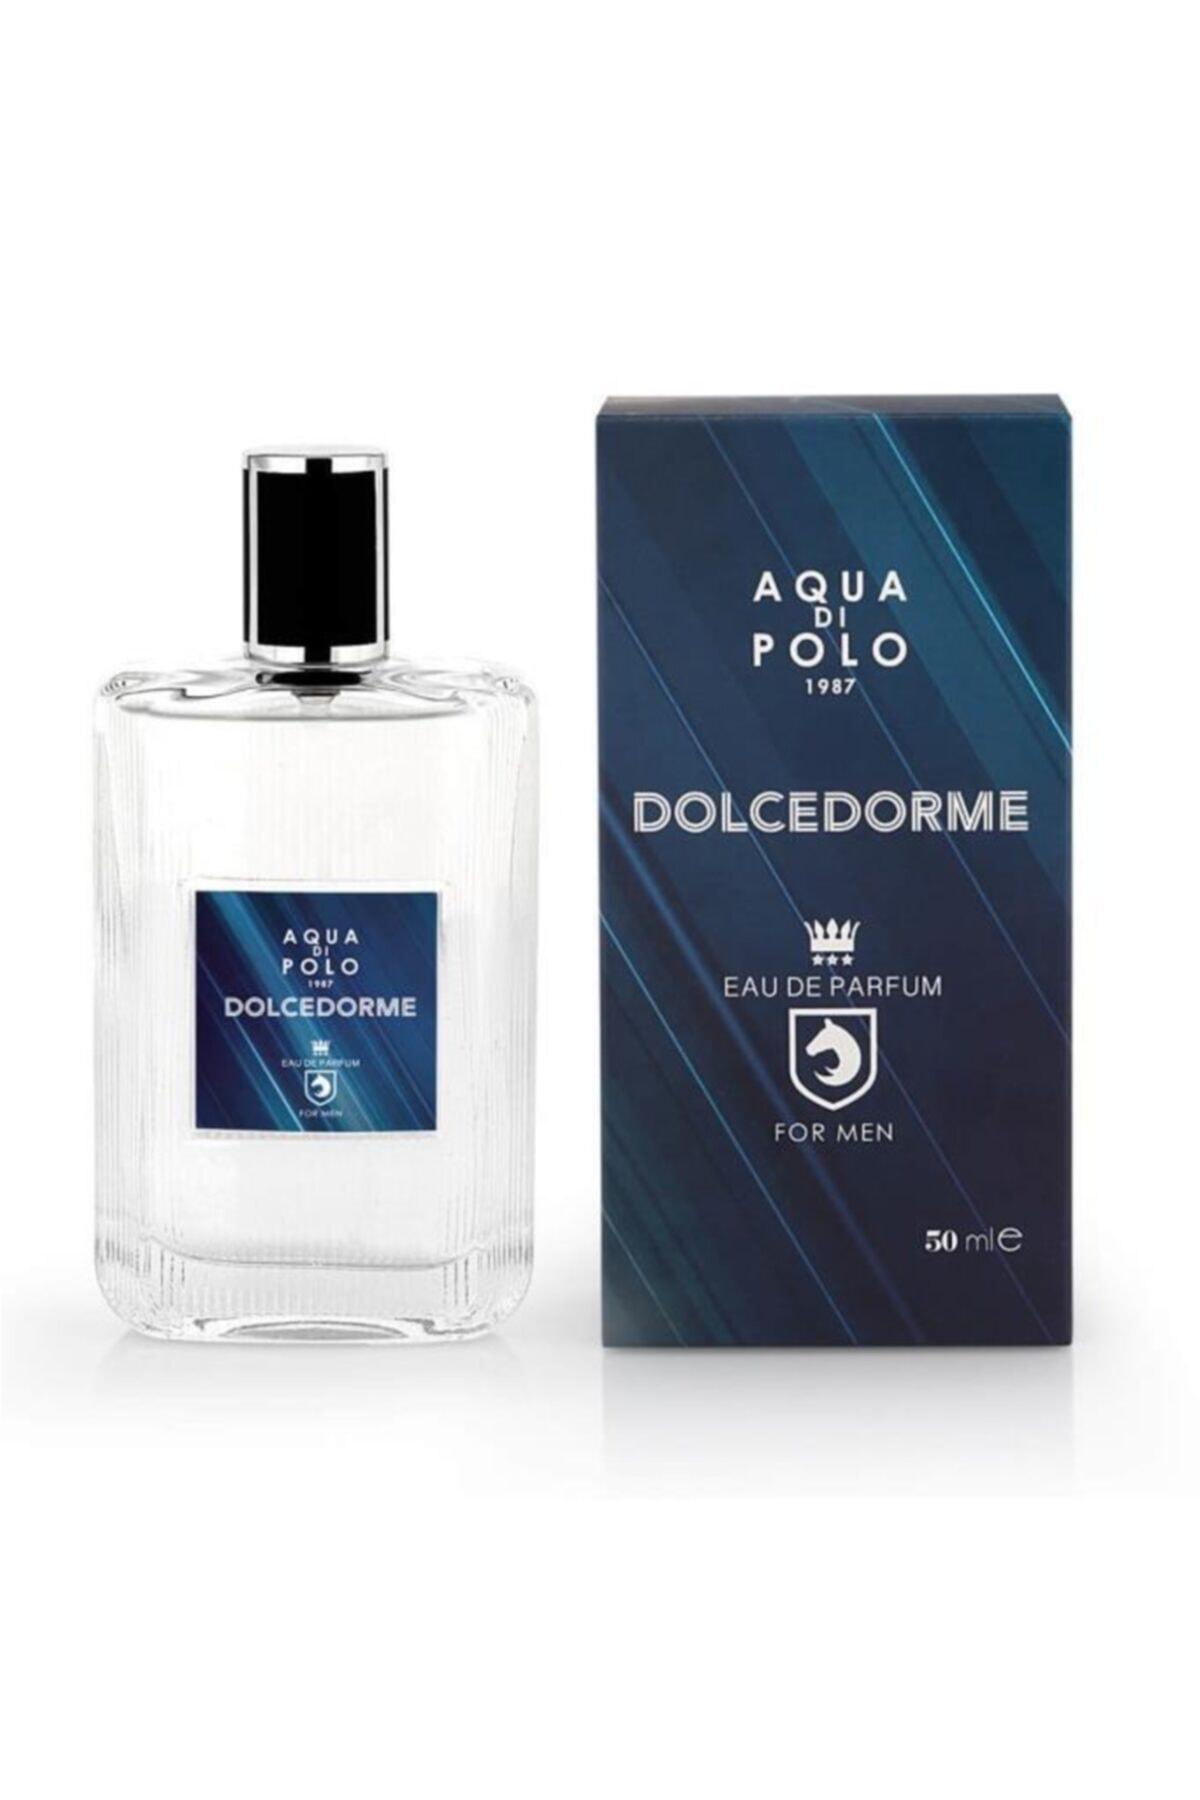 Aqua Di Polo 1987 Aqua Di Polo Dolcedorme Edp 50 Ml Erkek Parfümü 1